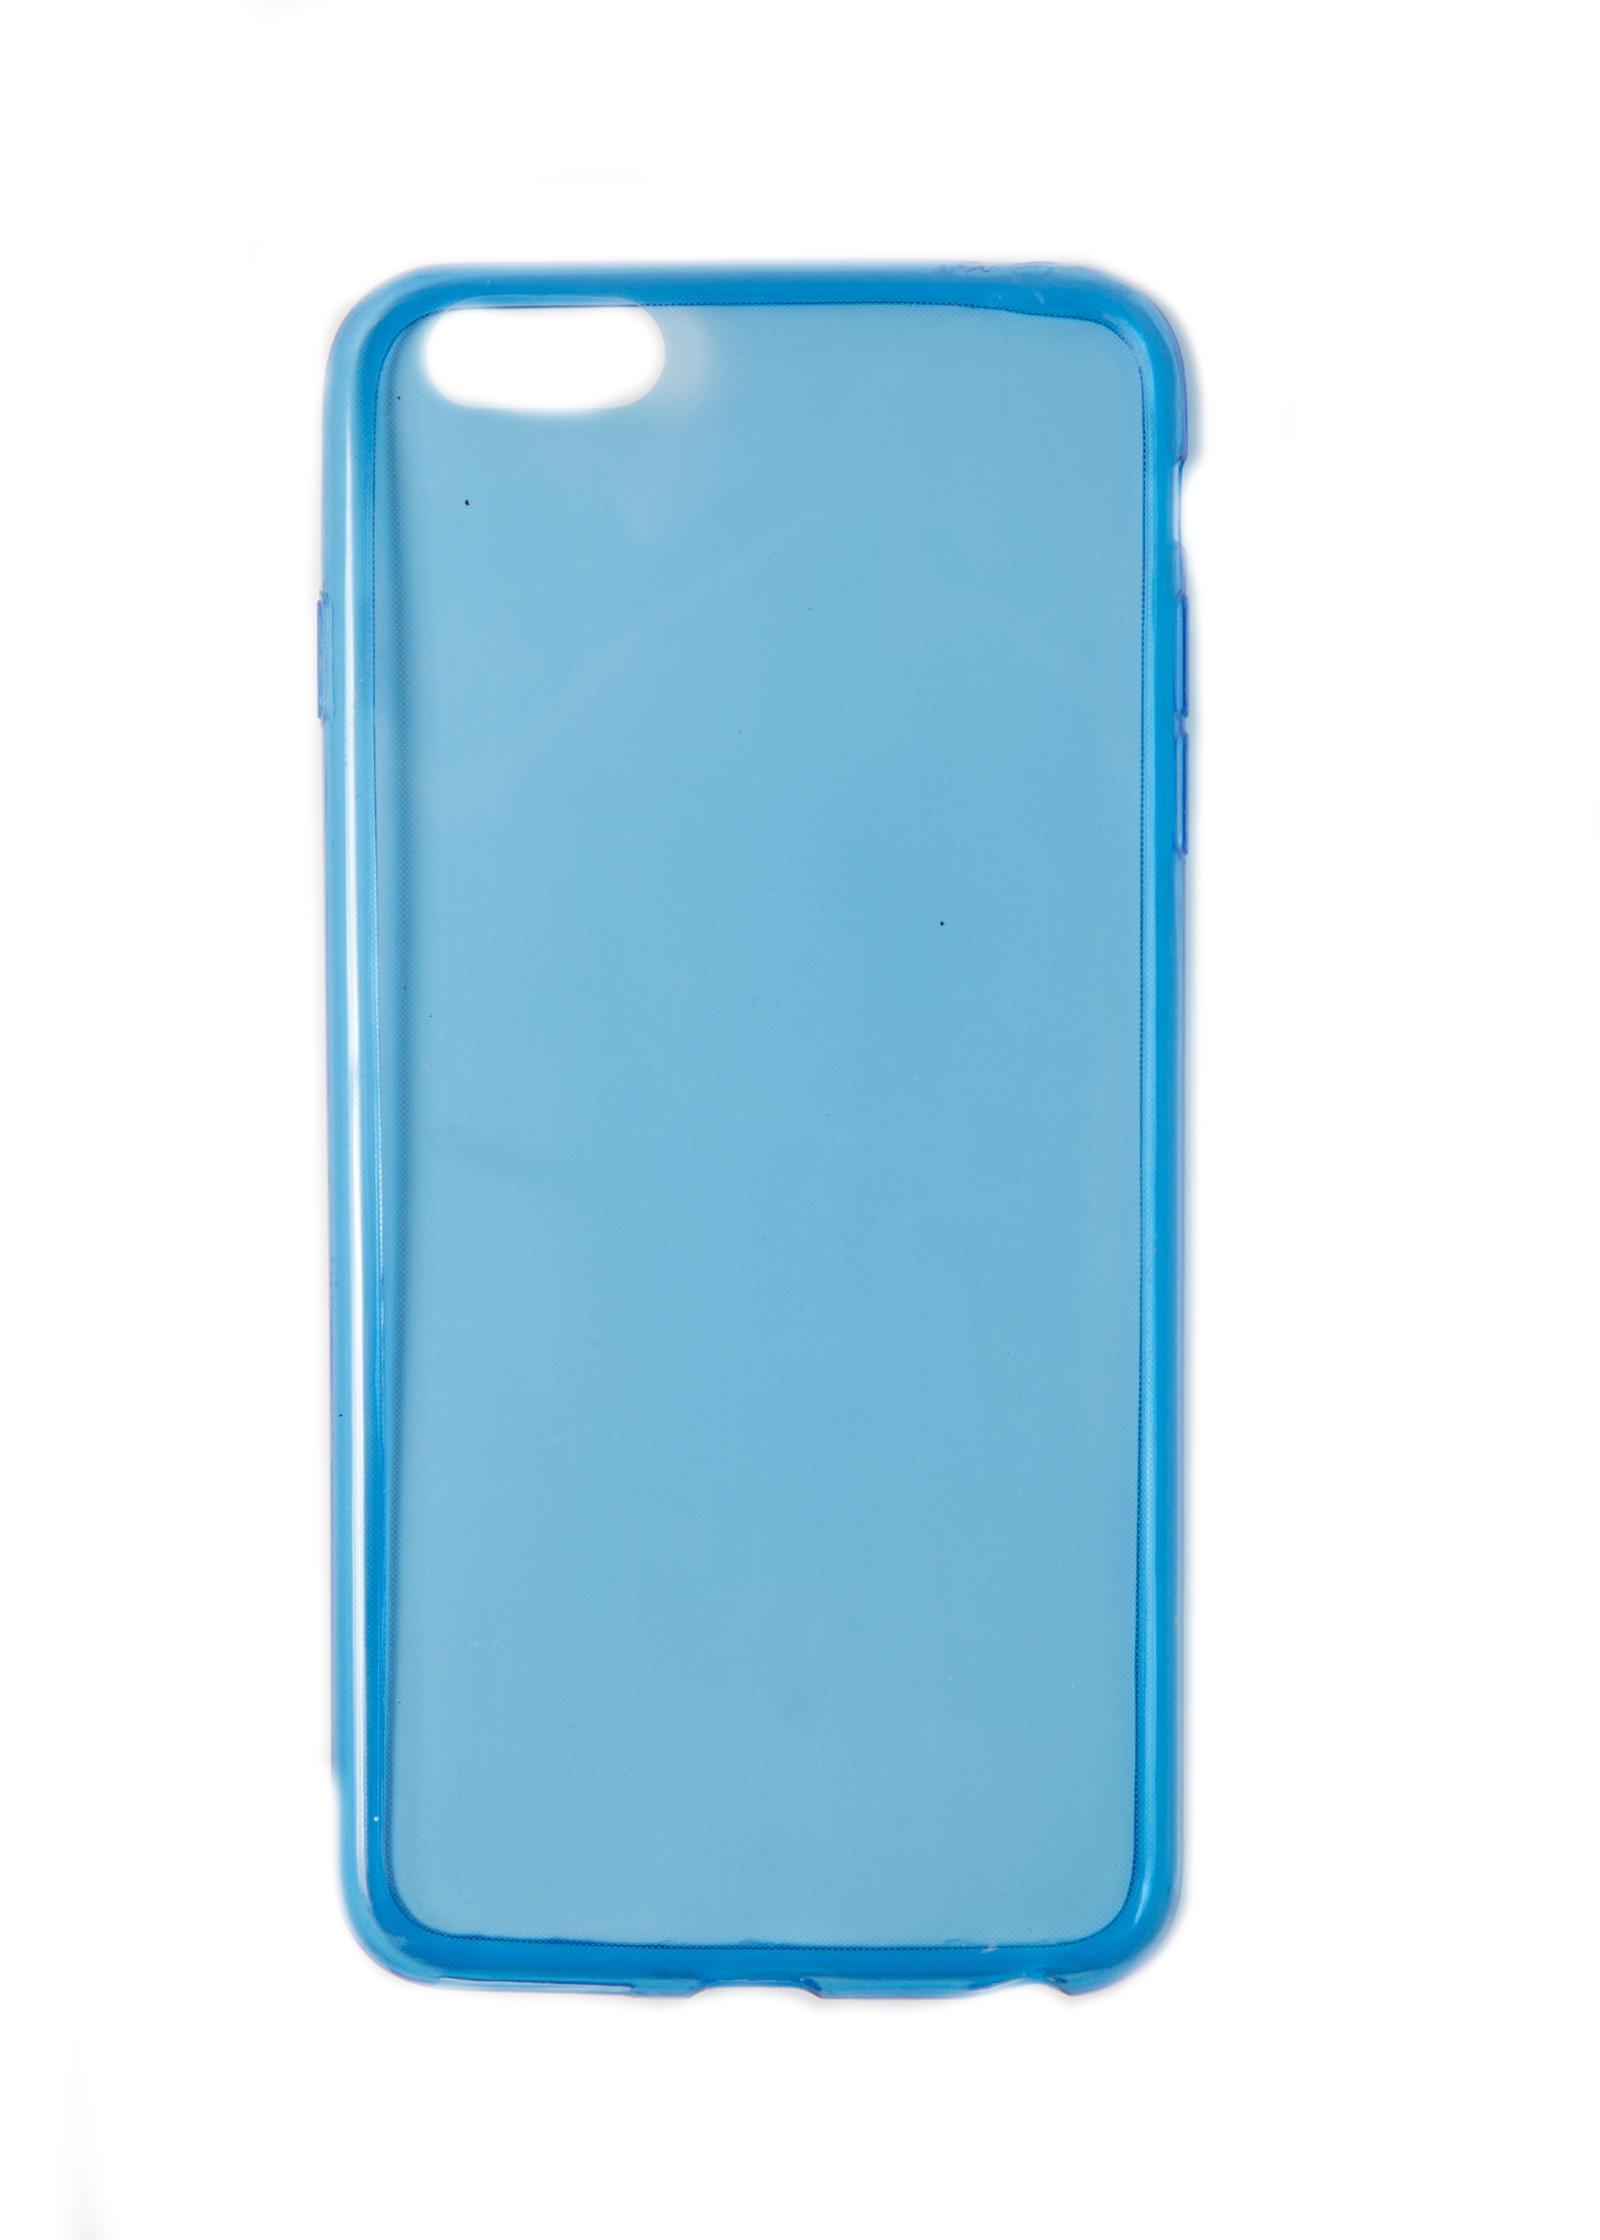 Чехол для сотового телефона Mitya Veselkov CASE, IP6.МITYA-248SIL цена